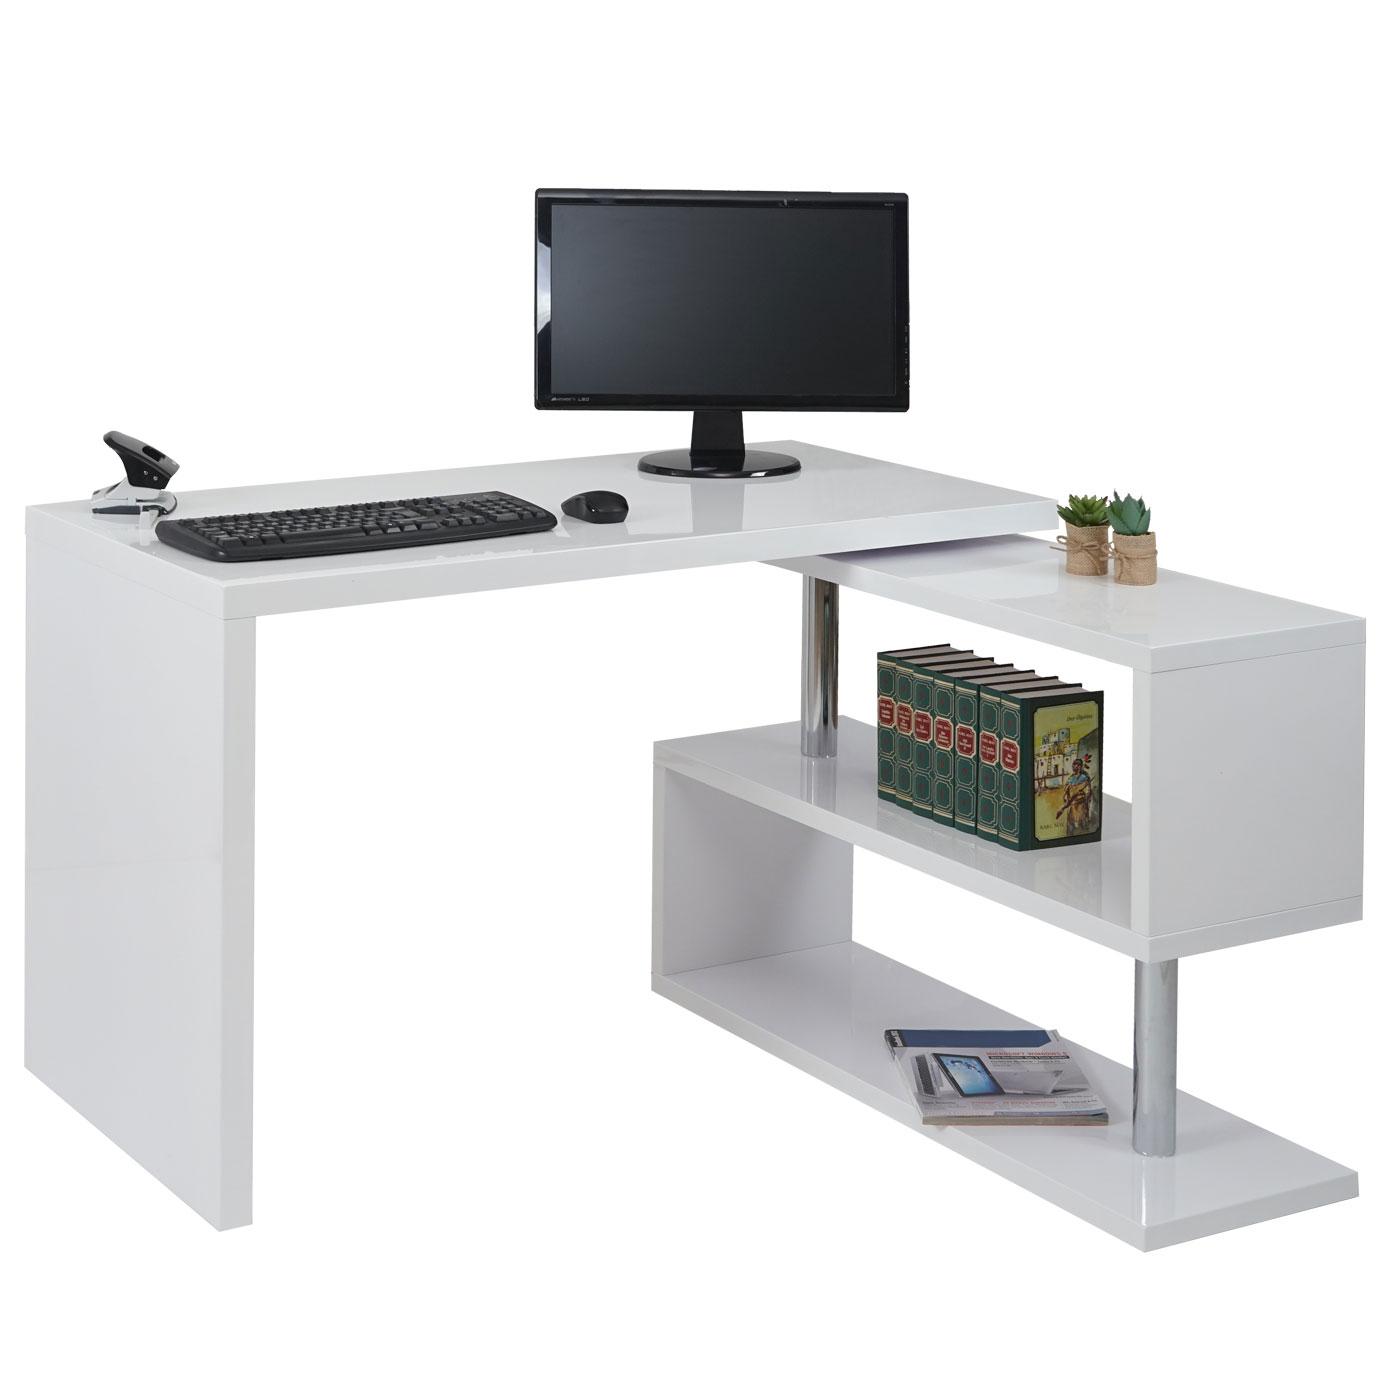 Eckschreibtisch hwc a68 b rotisch schreibtisch hochglanz for Schreibtisch drehbar